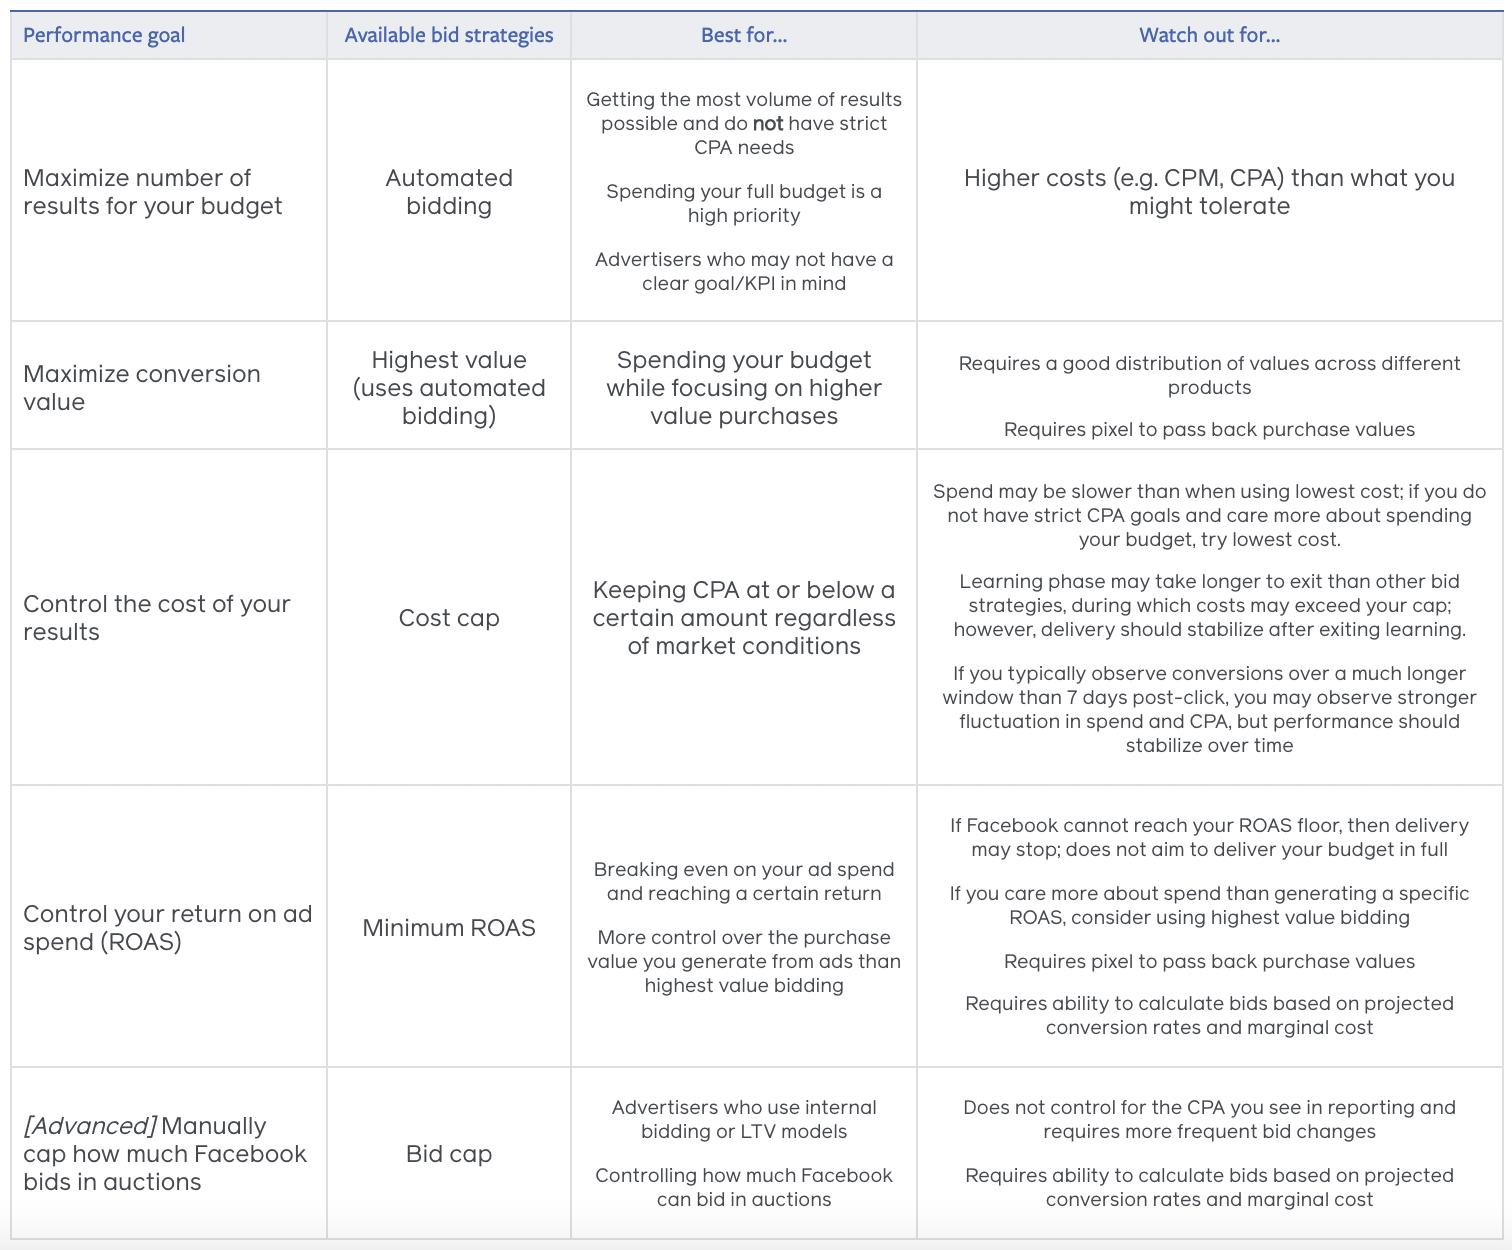 The best Facebook bidding strategies according to Facebook